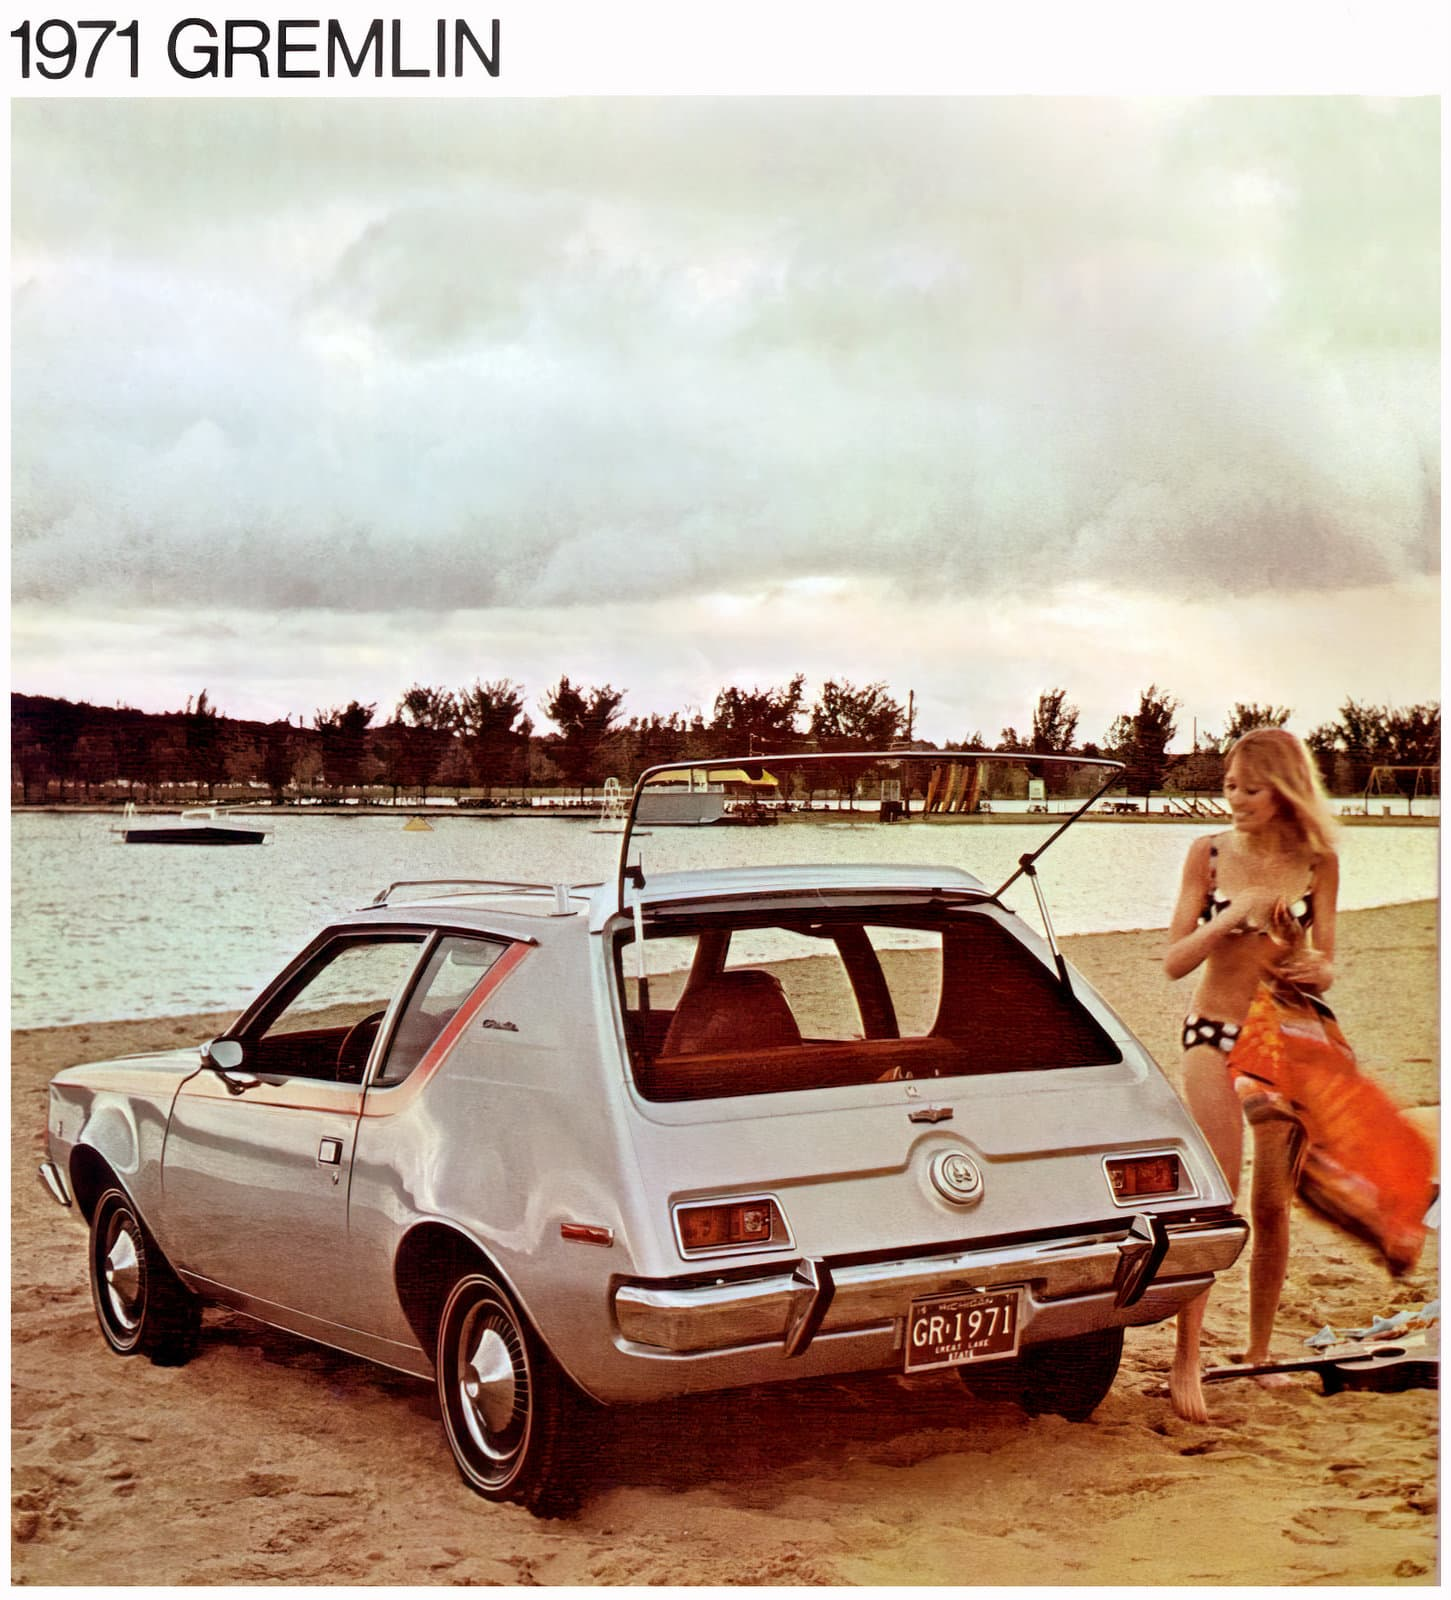 Vintage 1971 AMC Gremlin - American Motors